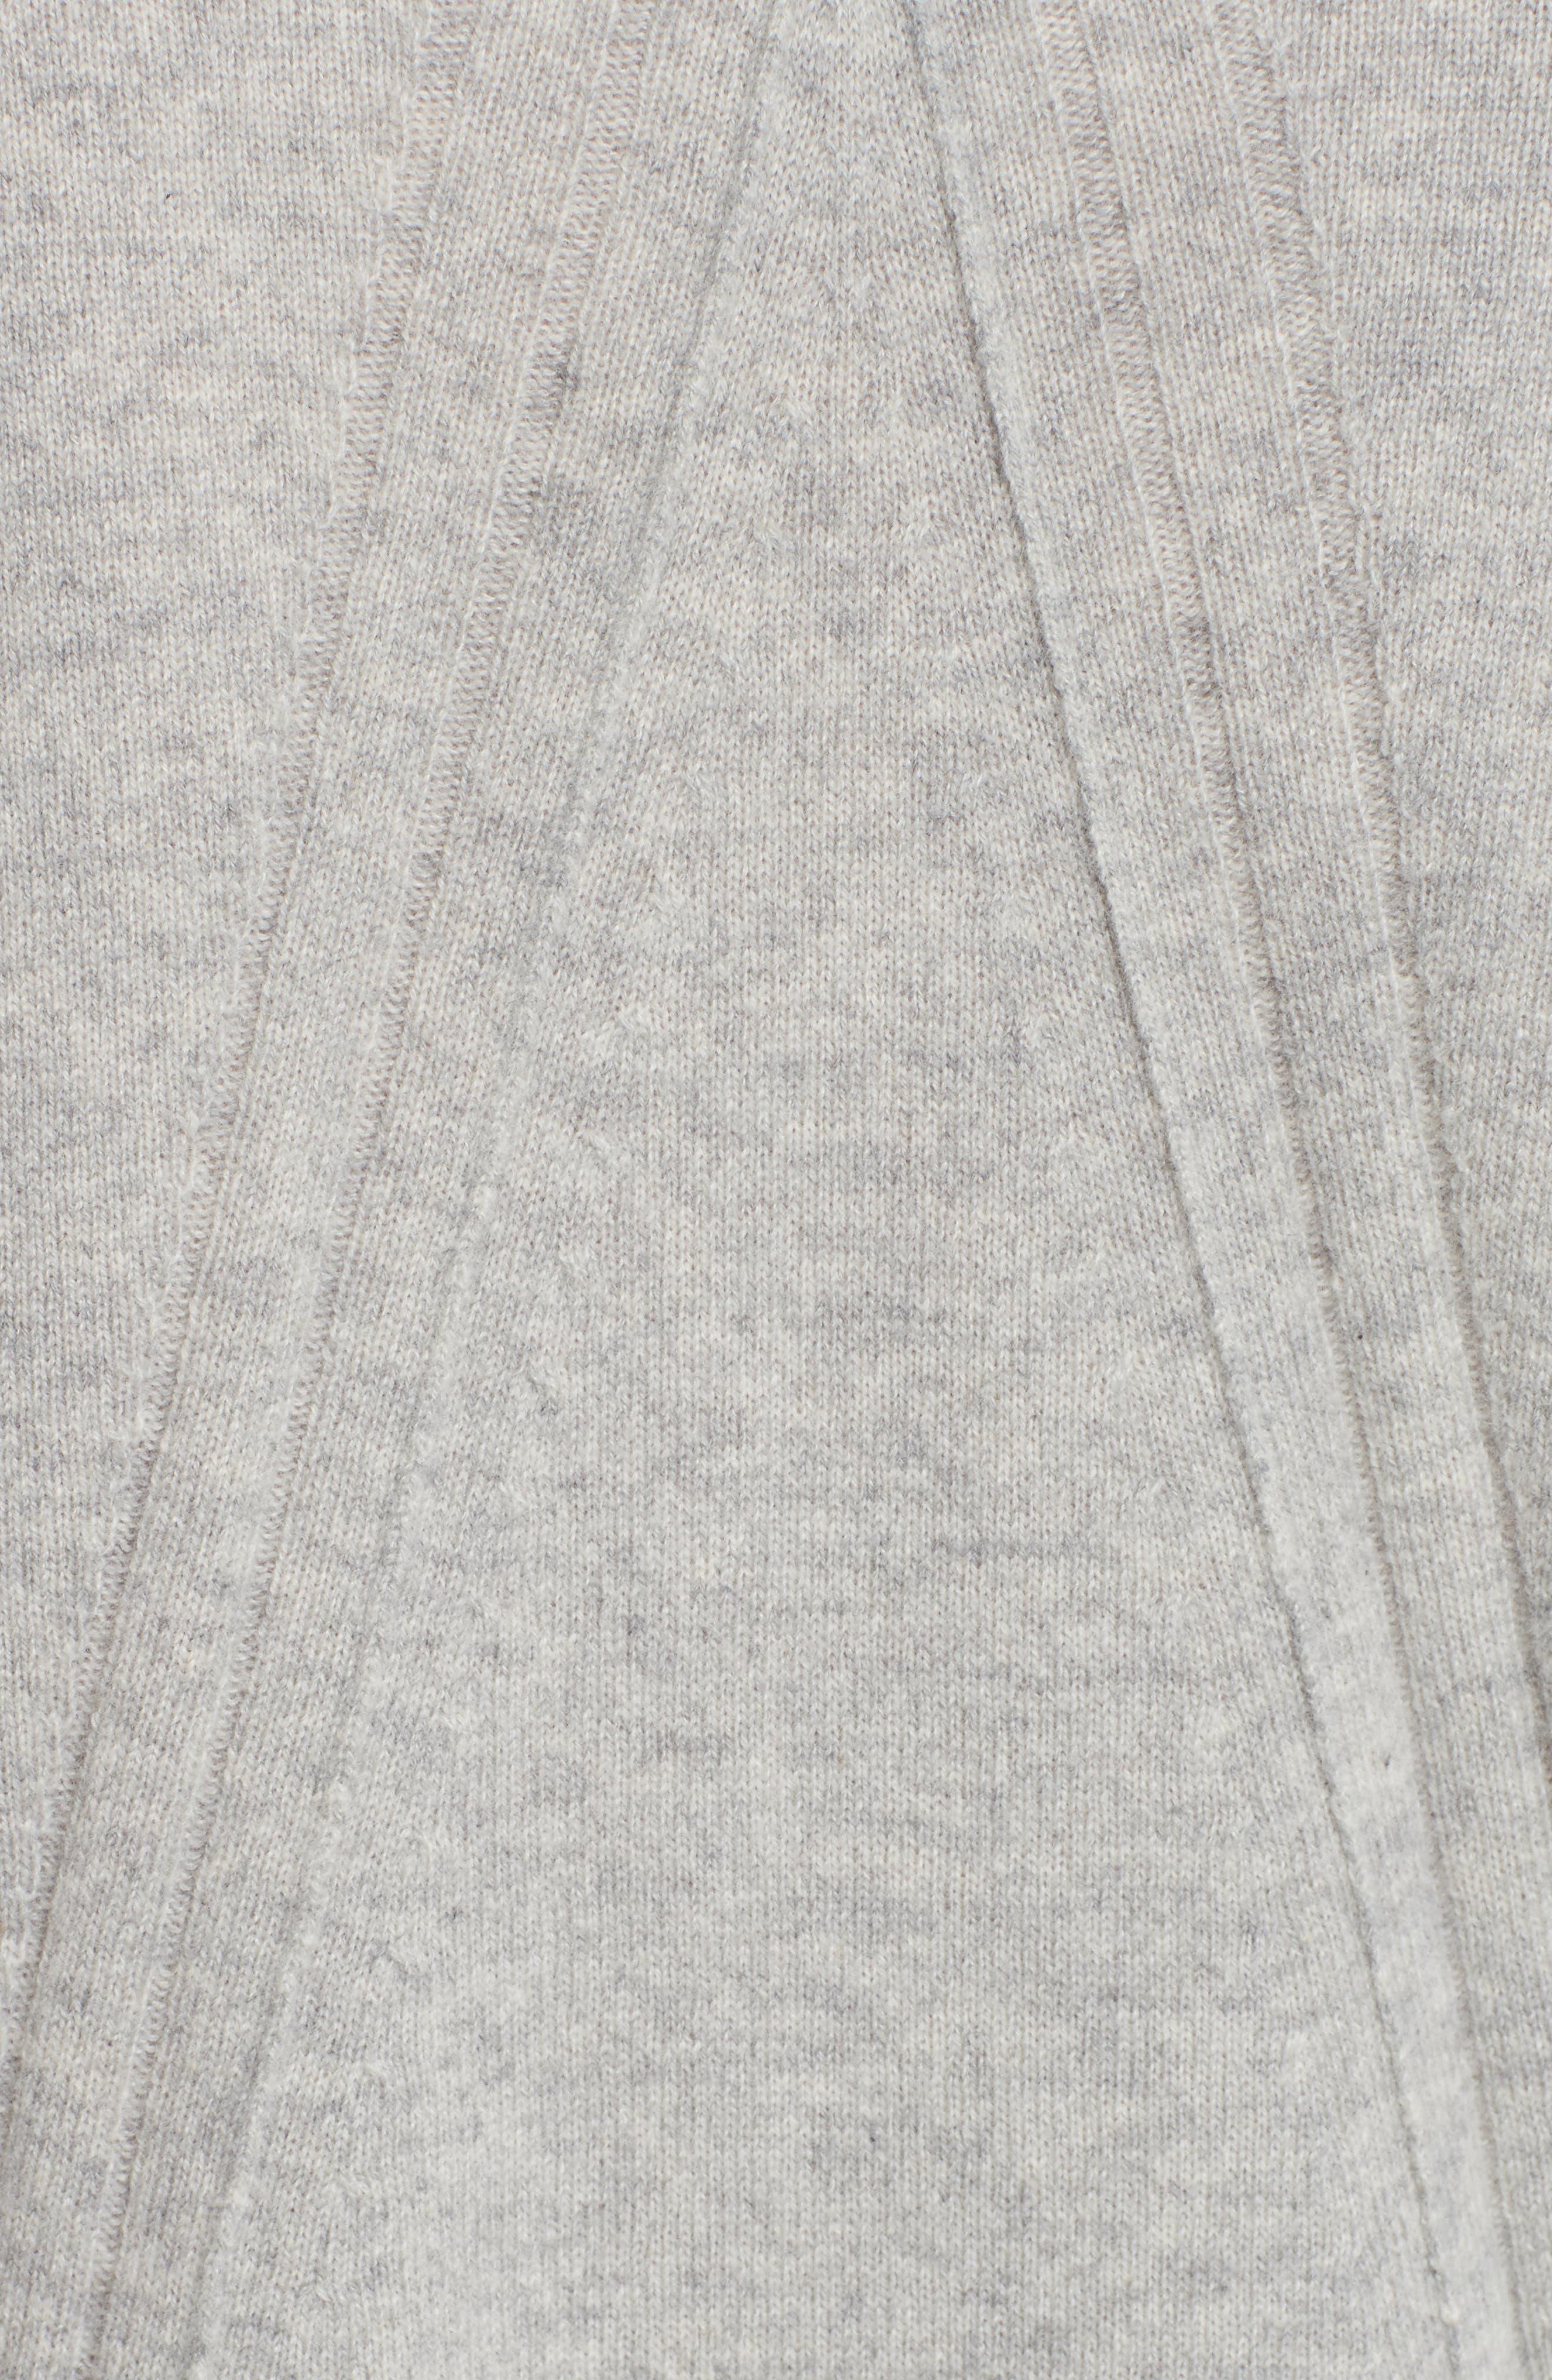 Ace Cashmere Sweater,                             Alternate thumbnail 5, color,                             058